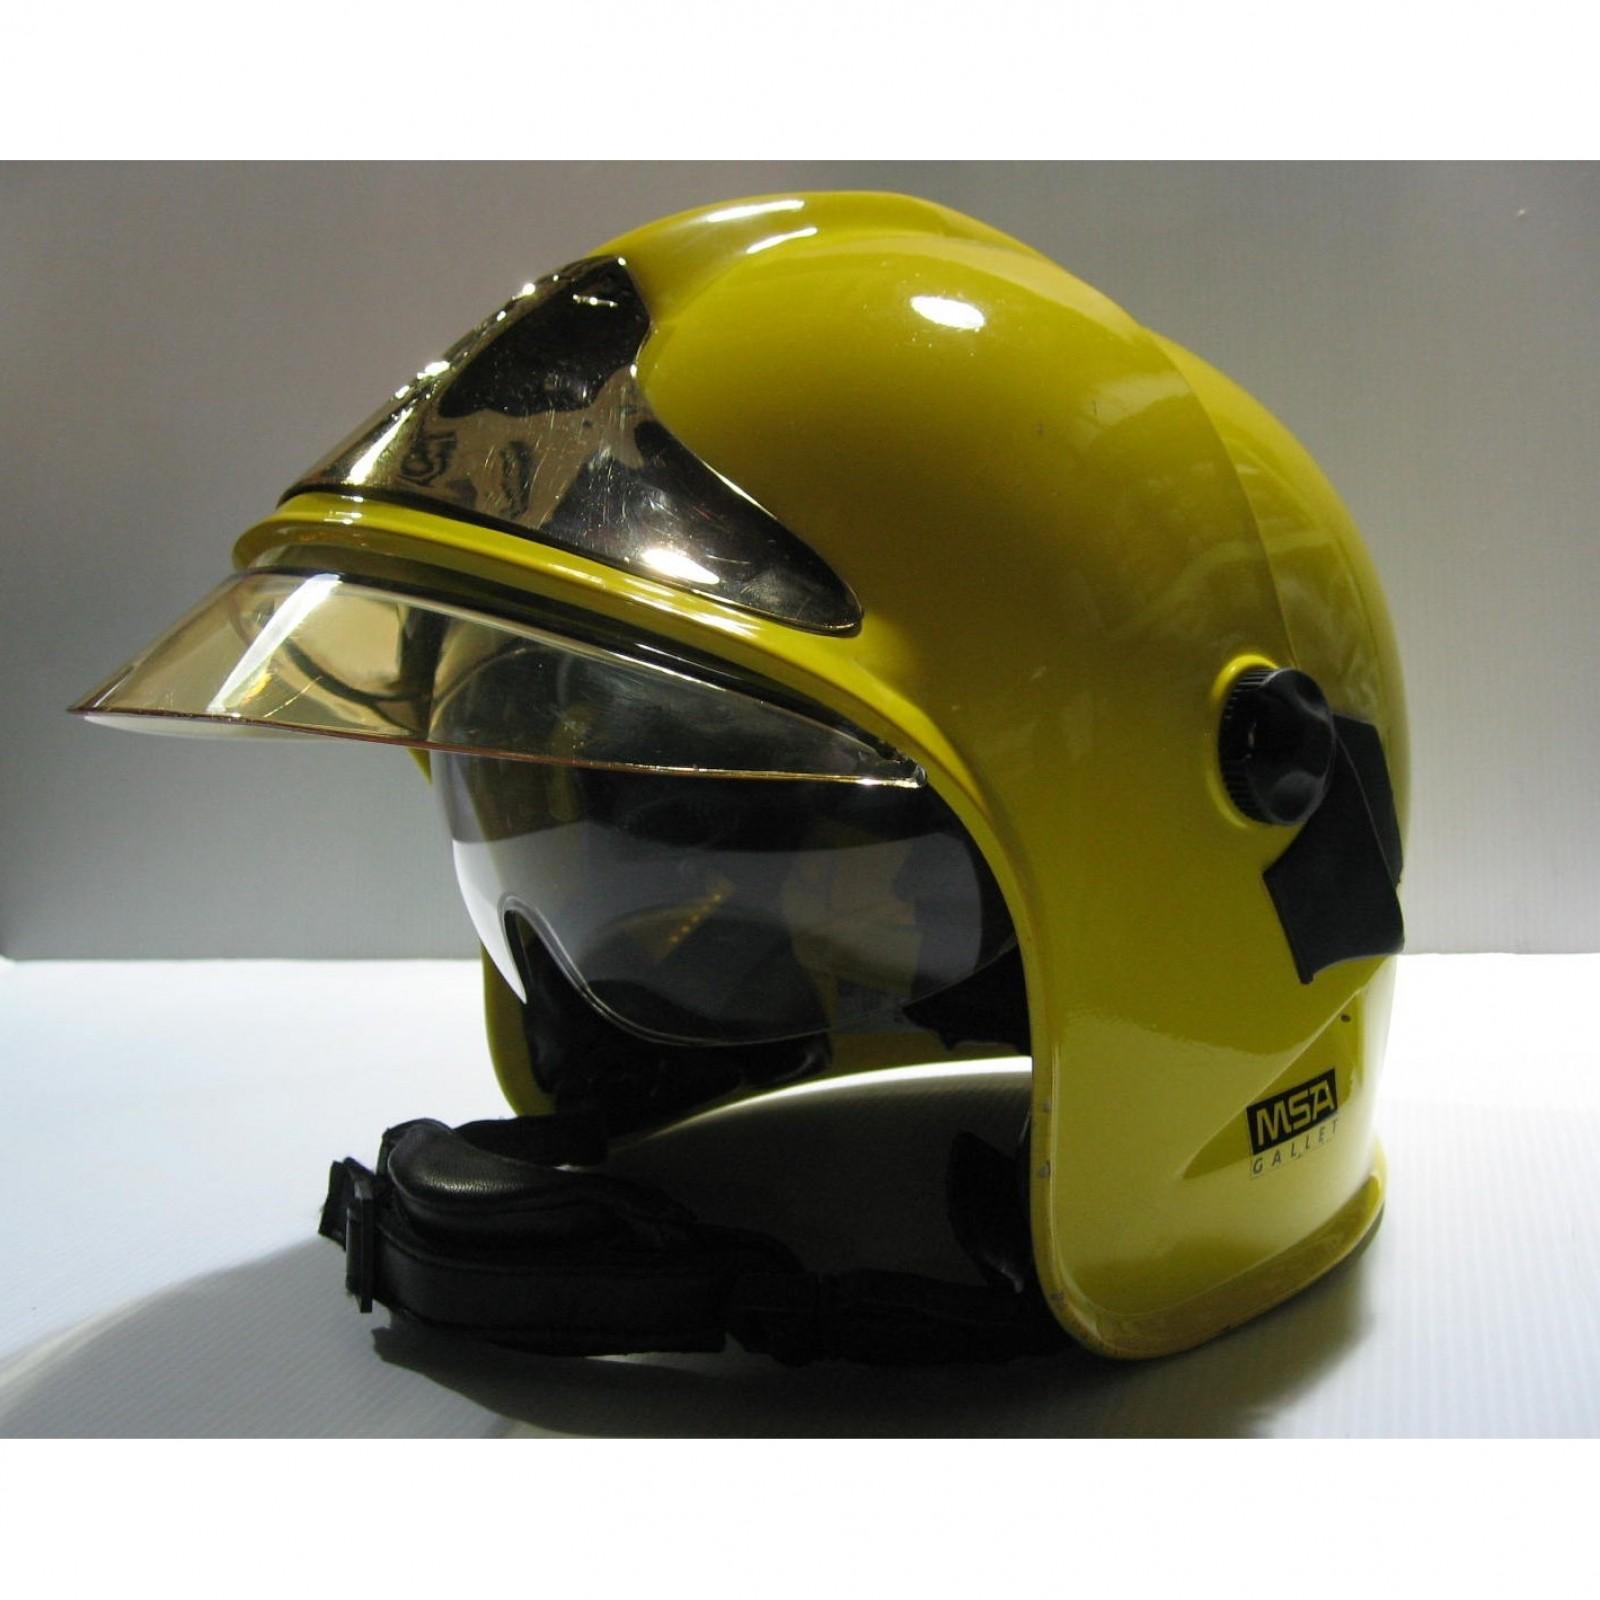 Msa Gallet F1s Firefighter Helmet Yellow Demonstration Unit